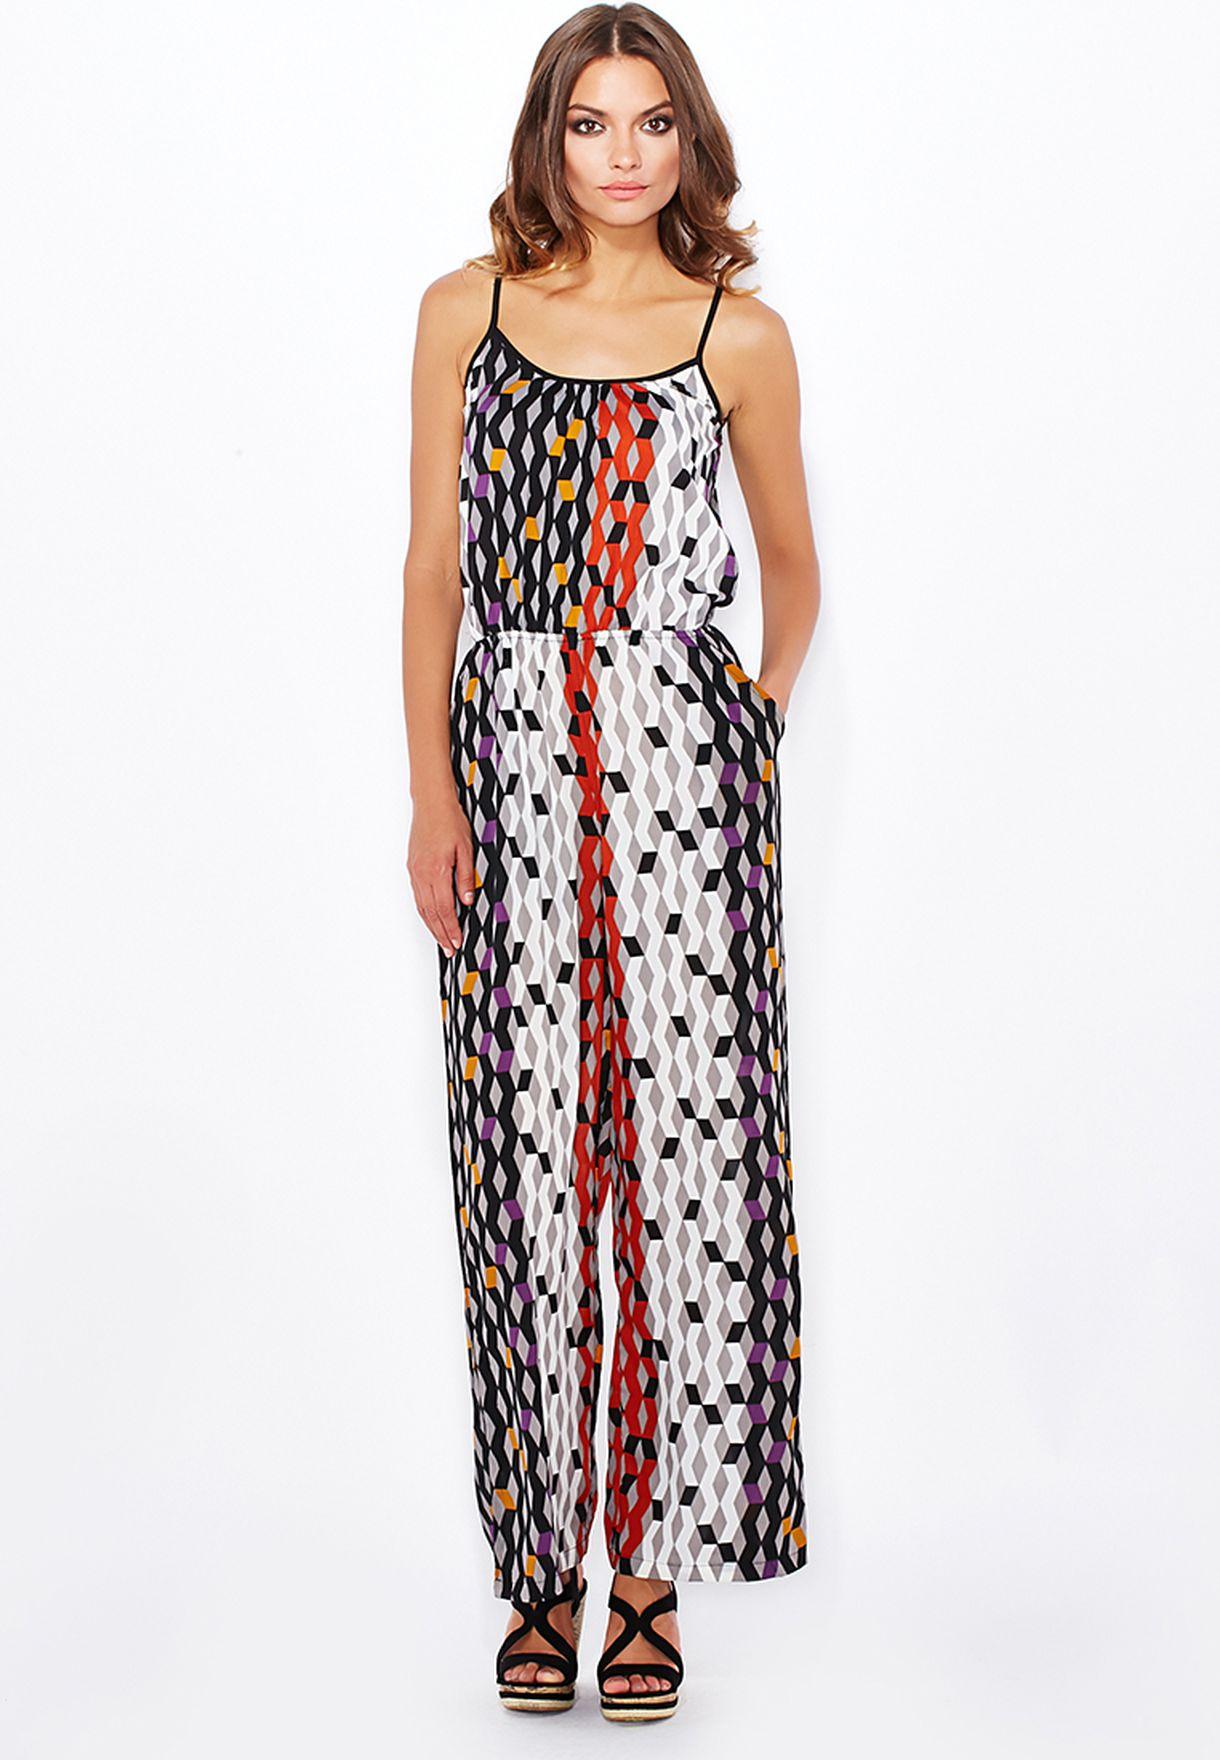 849f070da70 Shop Boohoo prints Geo Print Jumpsuit AZZ22058 for Women in Bahrain -  BO797AT73CXU